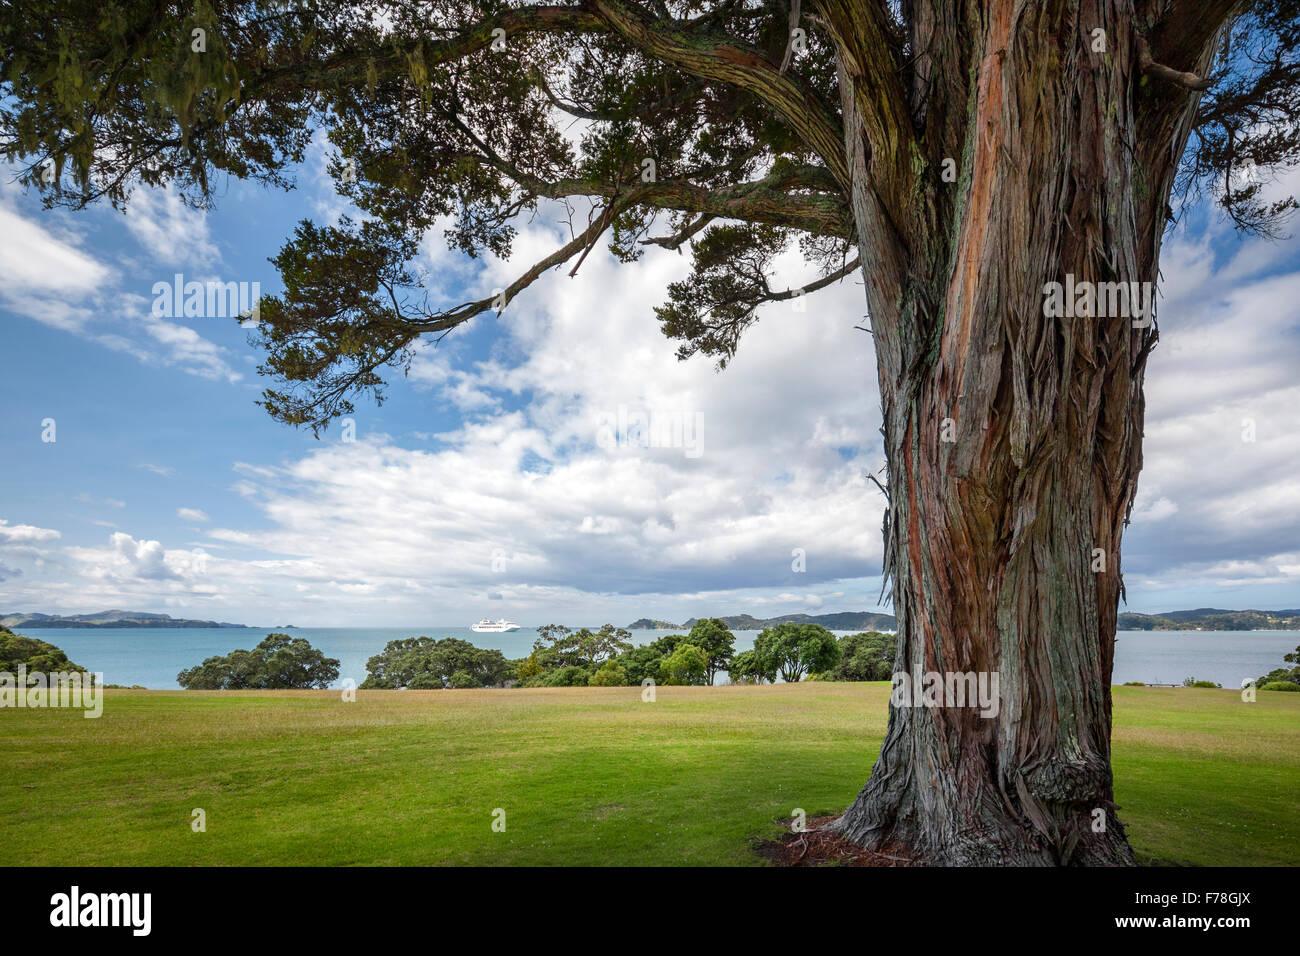 https://c7.alamy.com/comp/F78GJX/new-zealand-waitangi-treaty-grounds-and-the-bay-of-islands-cruise-F78GJX.jpg